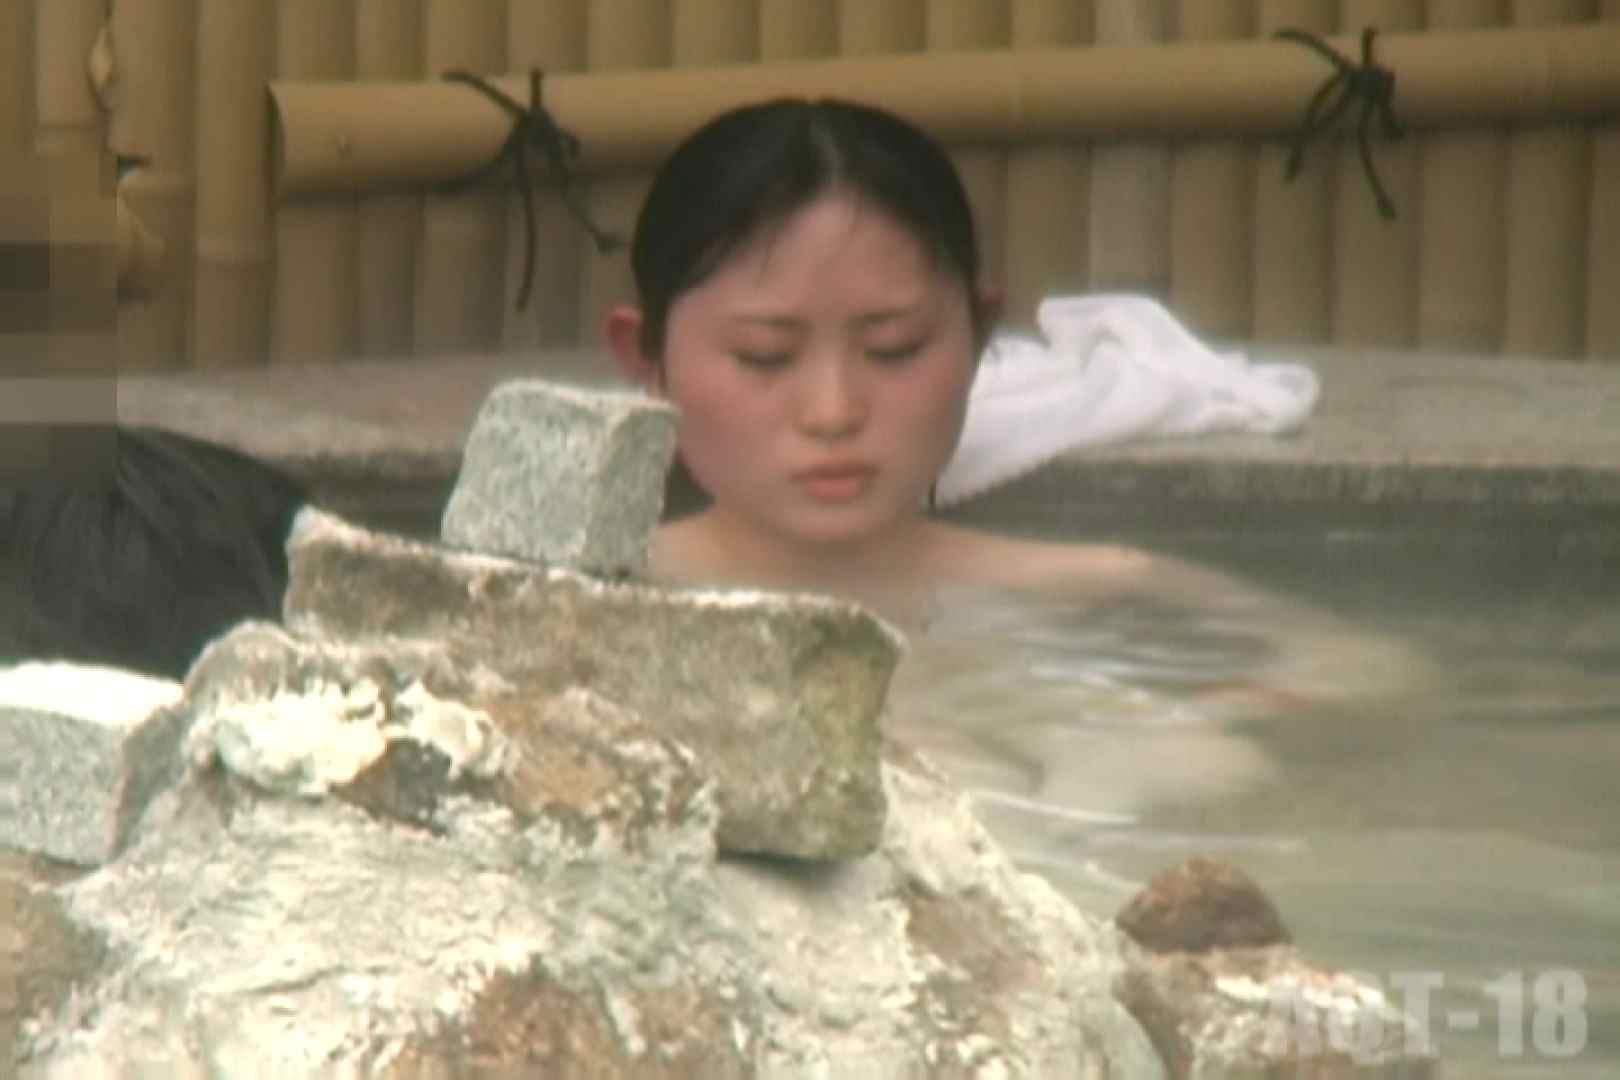 Aquaな露天風呂Vol.863 OL  38連発 2